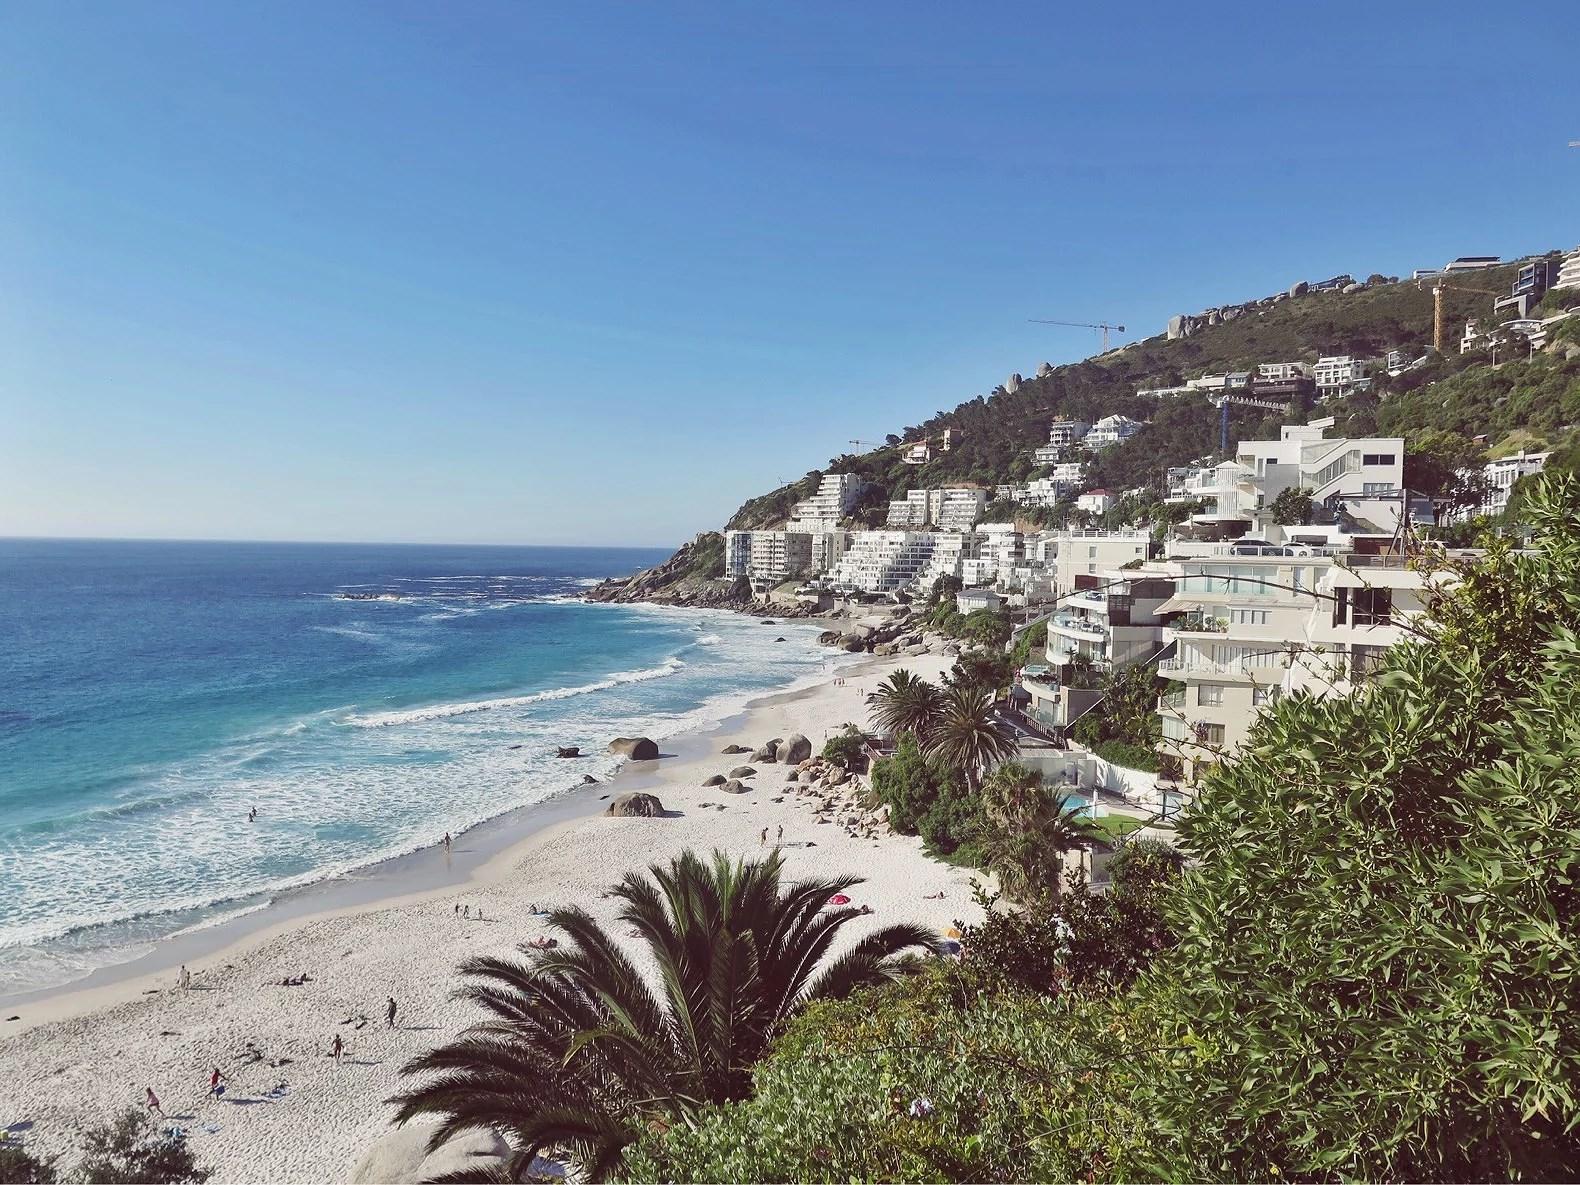 ~ Clifton beach vibes ~